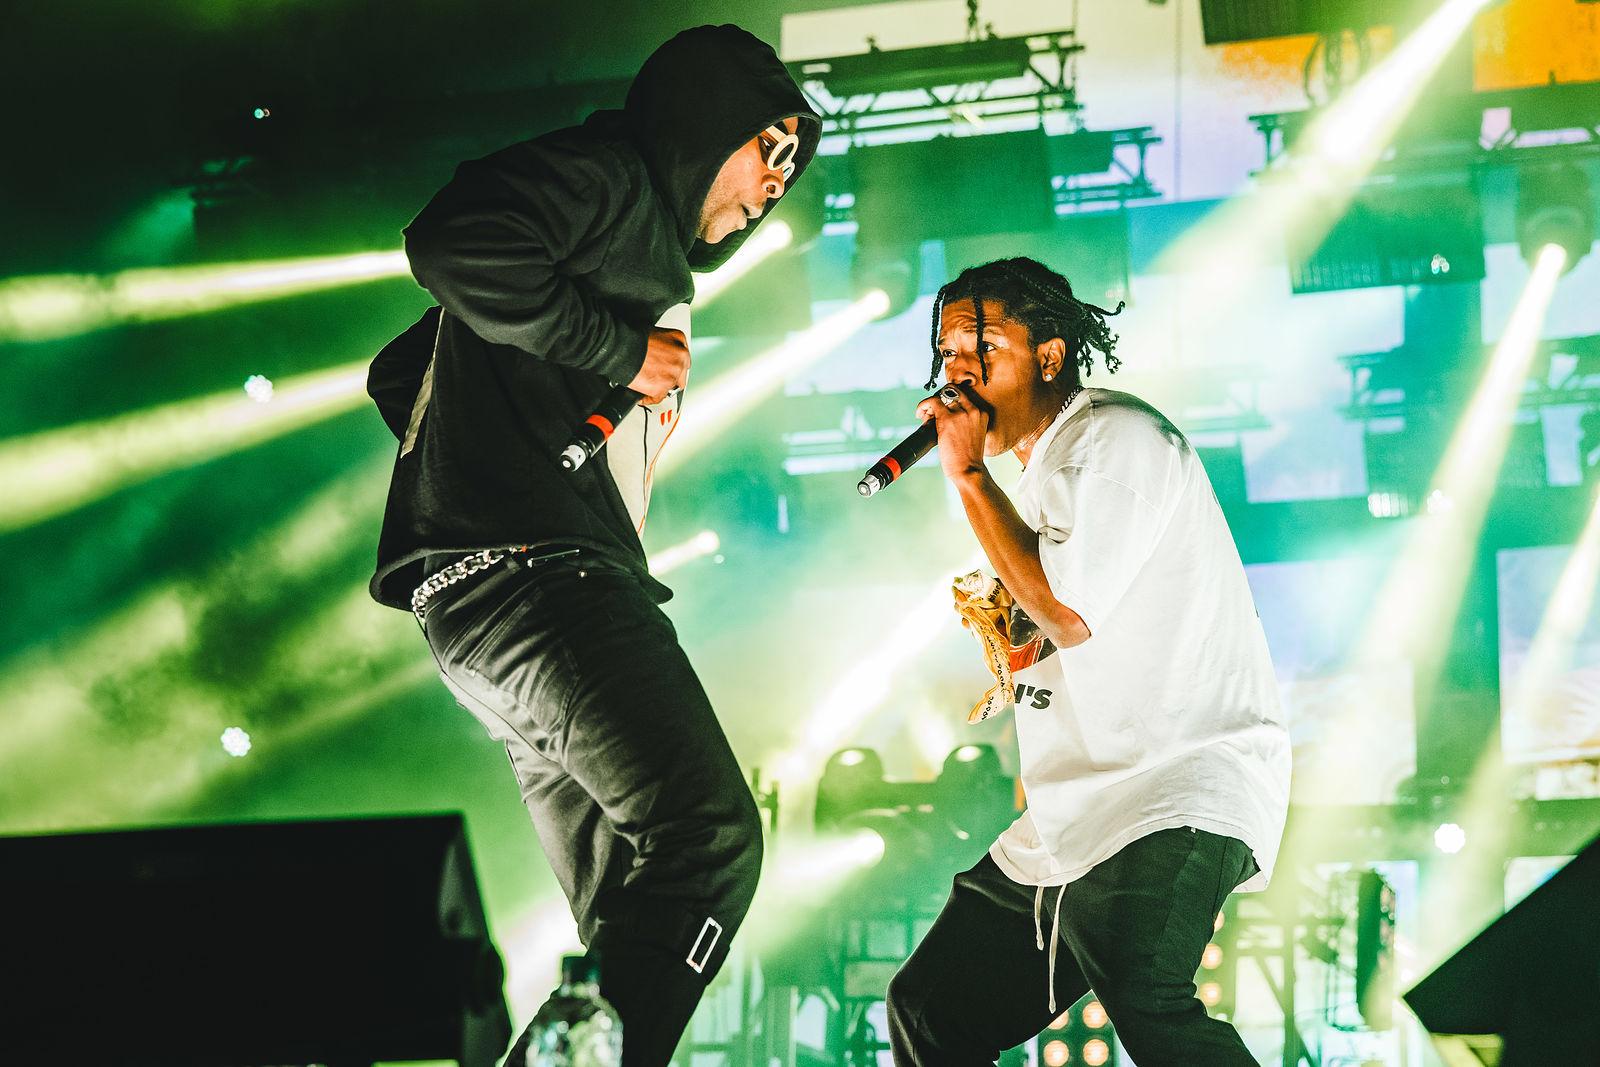 Parklife | Gallery | A$AP Rocky & Skepta | Skepta